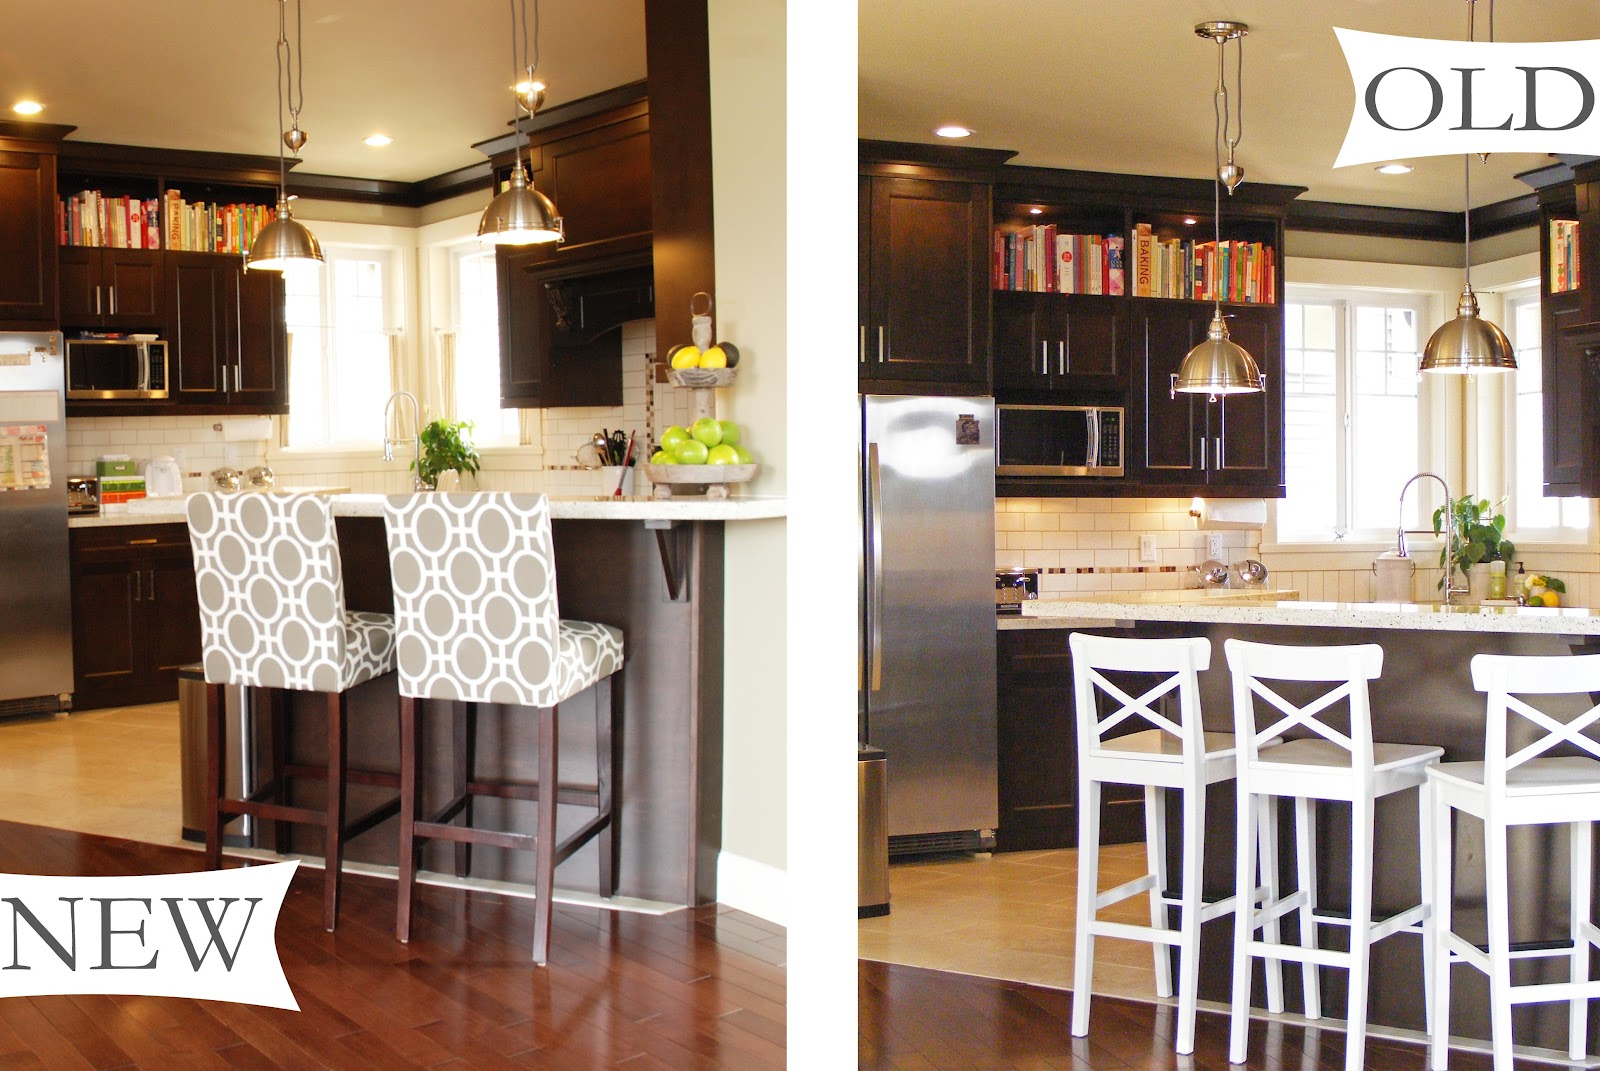 new kitchen bar stools